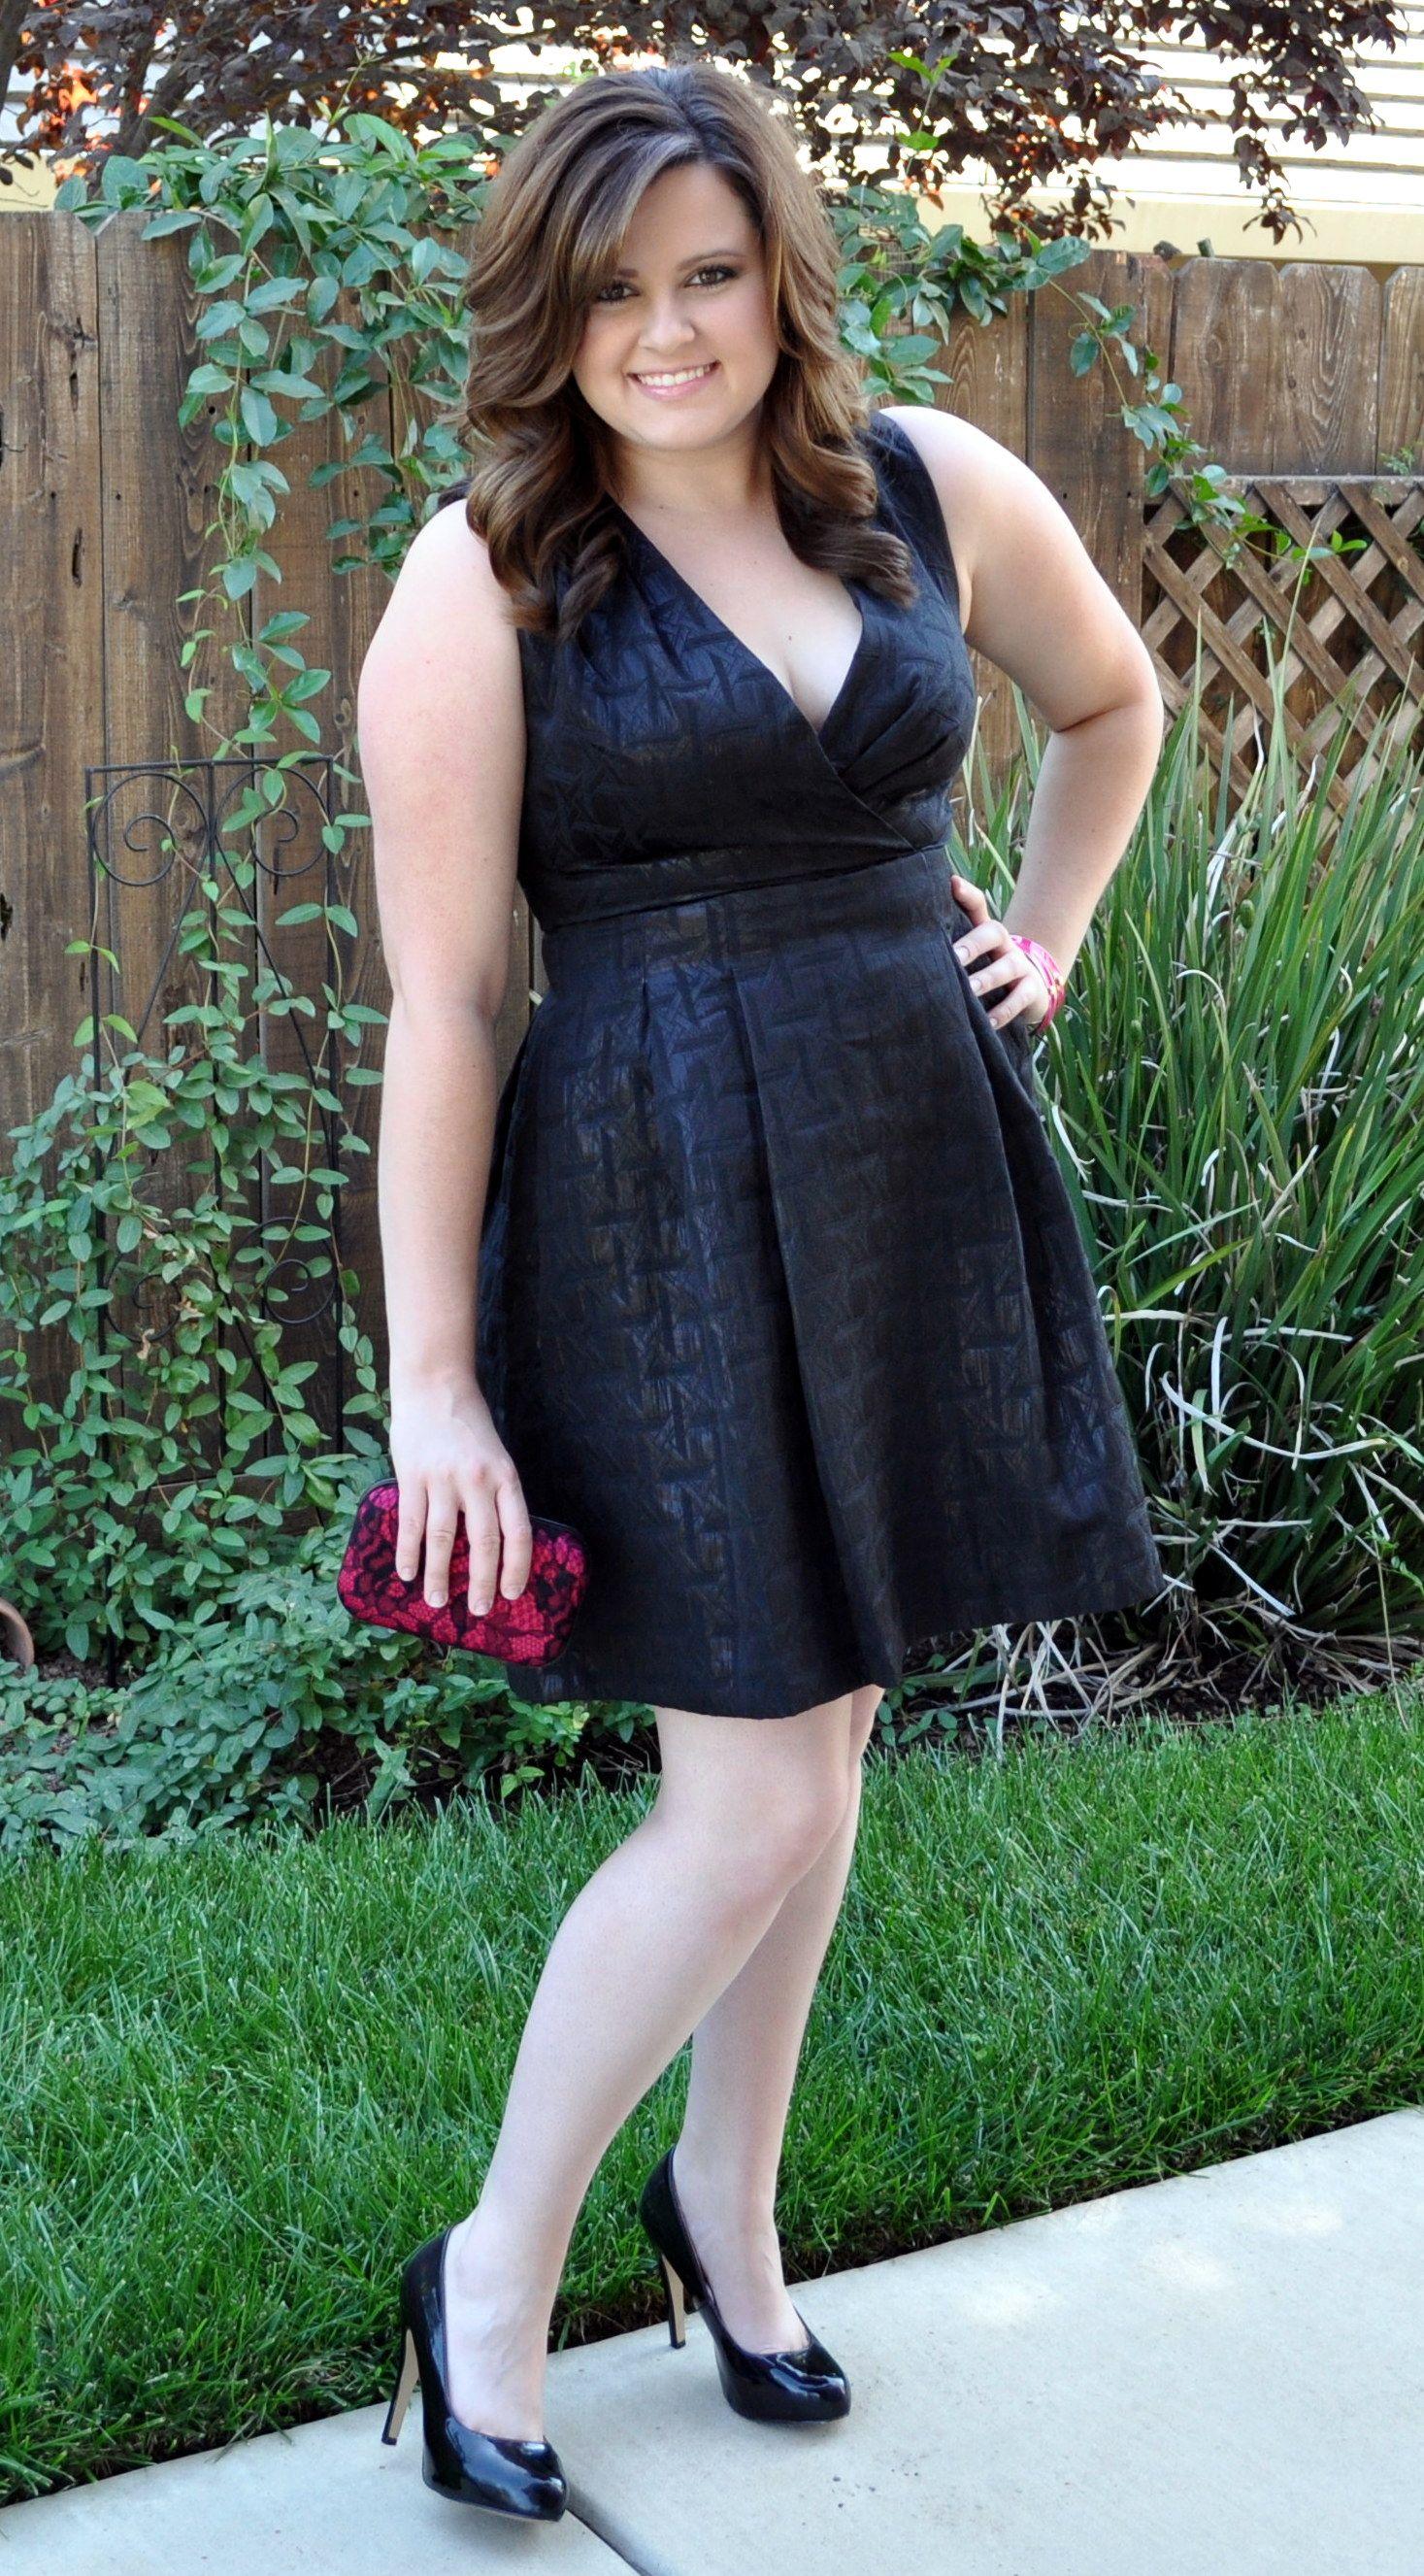 Little Black Dress Obsessed Dress By Kirna Zabete For Target Clutch By Kirna Zabete For Target And Shoes By Cottonon Dresses Little Black Dress Party Dress [ 2653 x 1467 Pixel ]